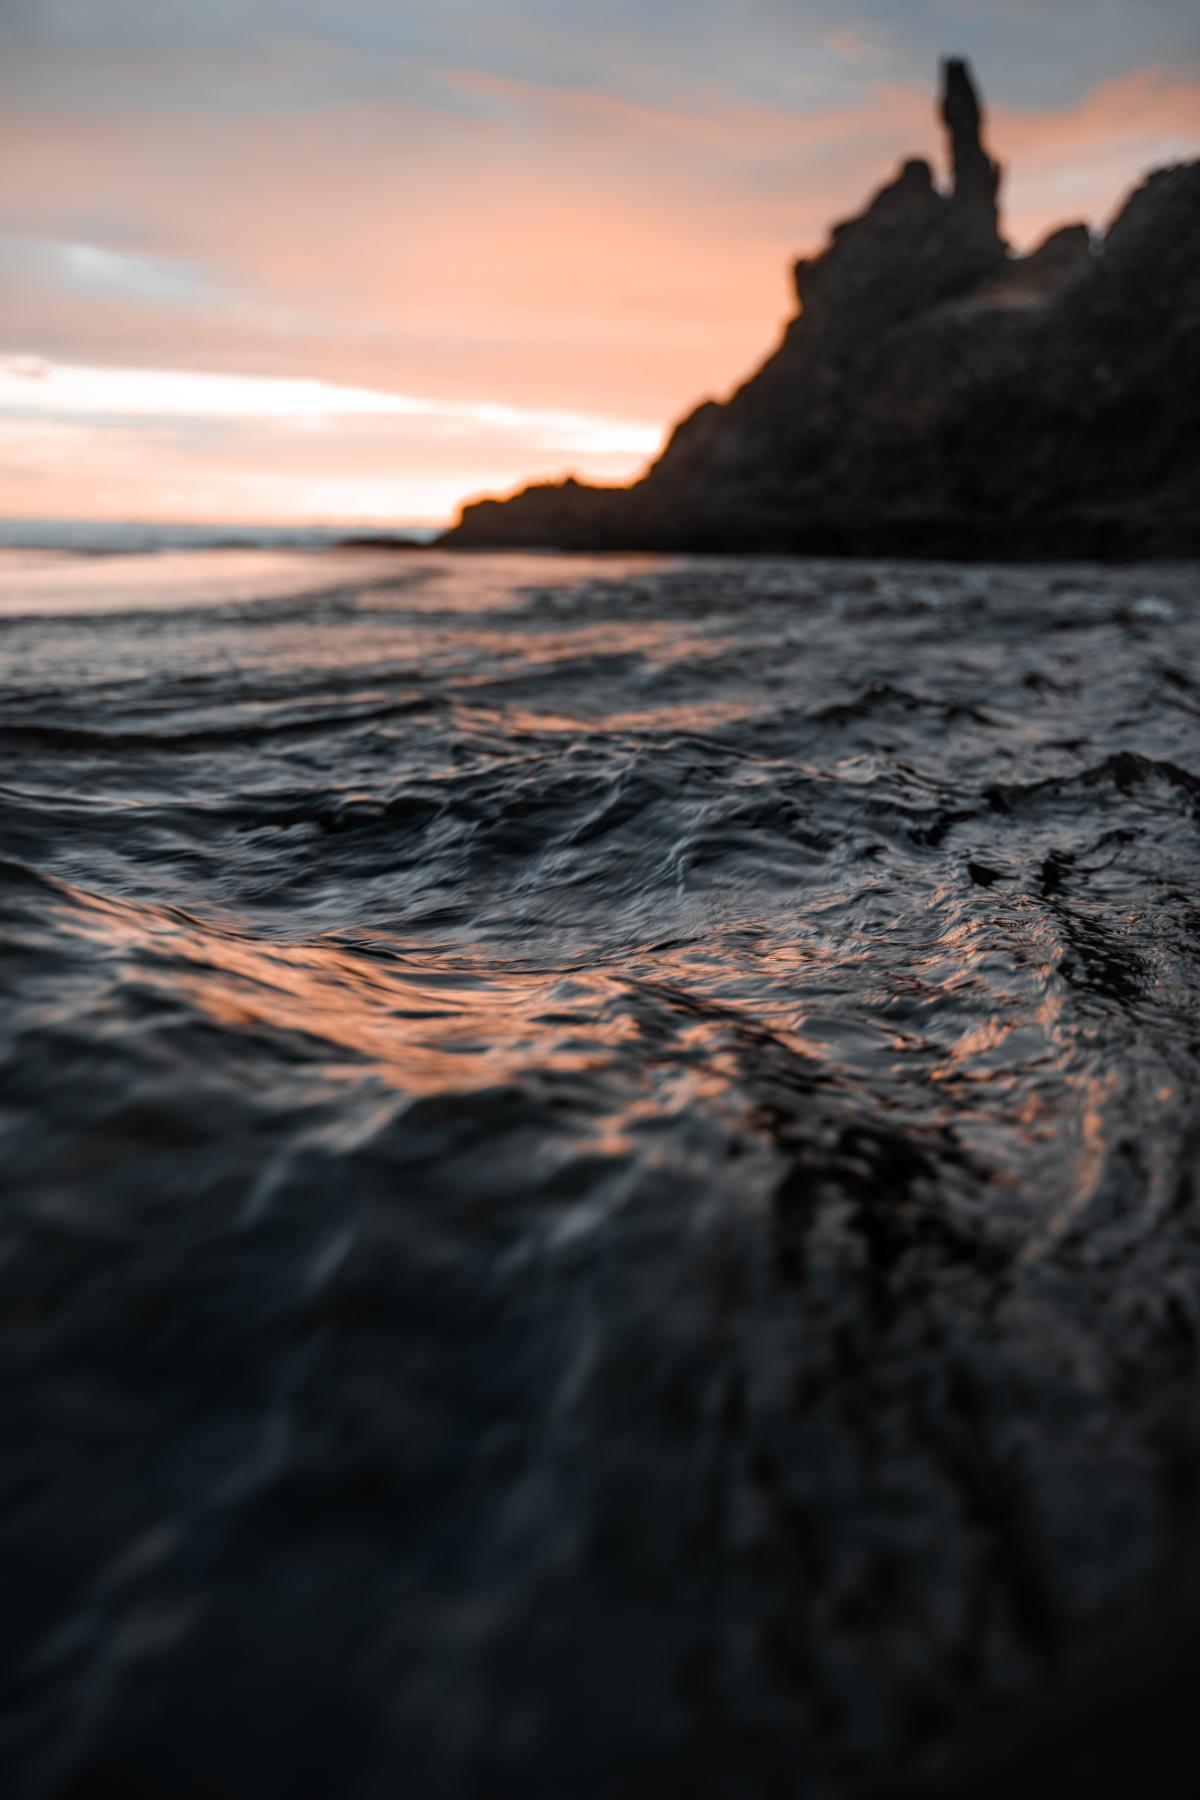 Ocean Body of water Sea